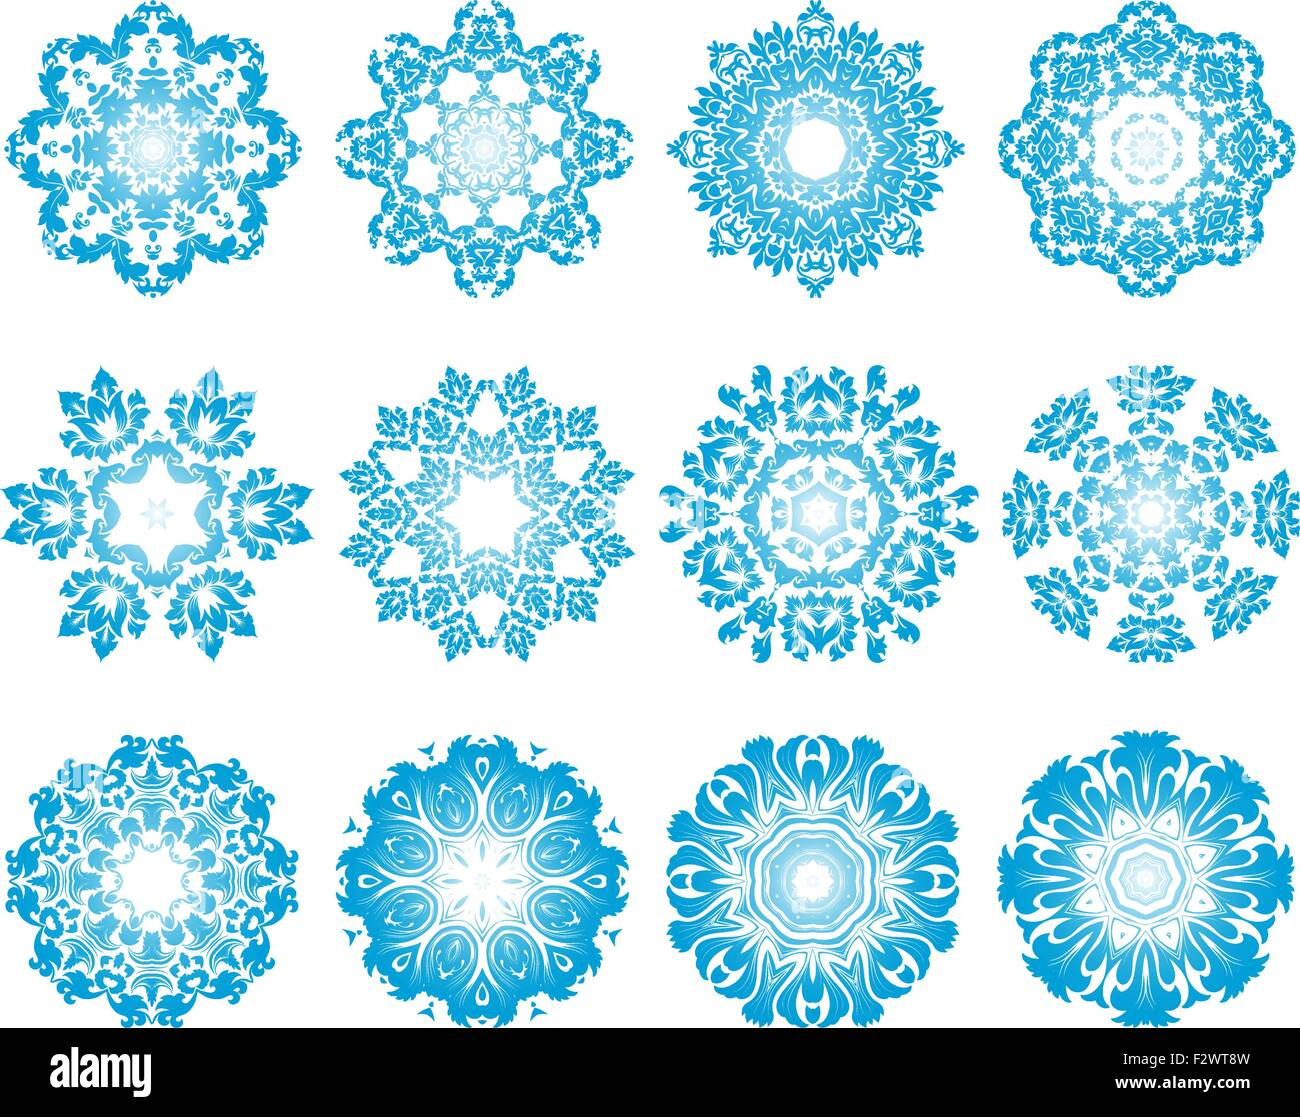 Snowflakes ornaments - Set Of Twelve Circle Snowflakes Ornaments Vector Illustration